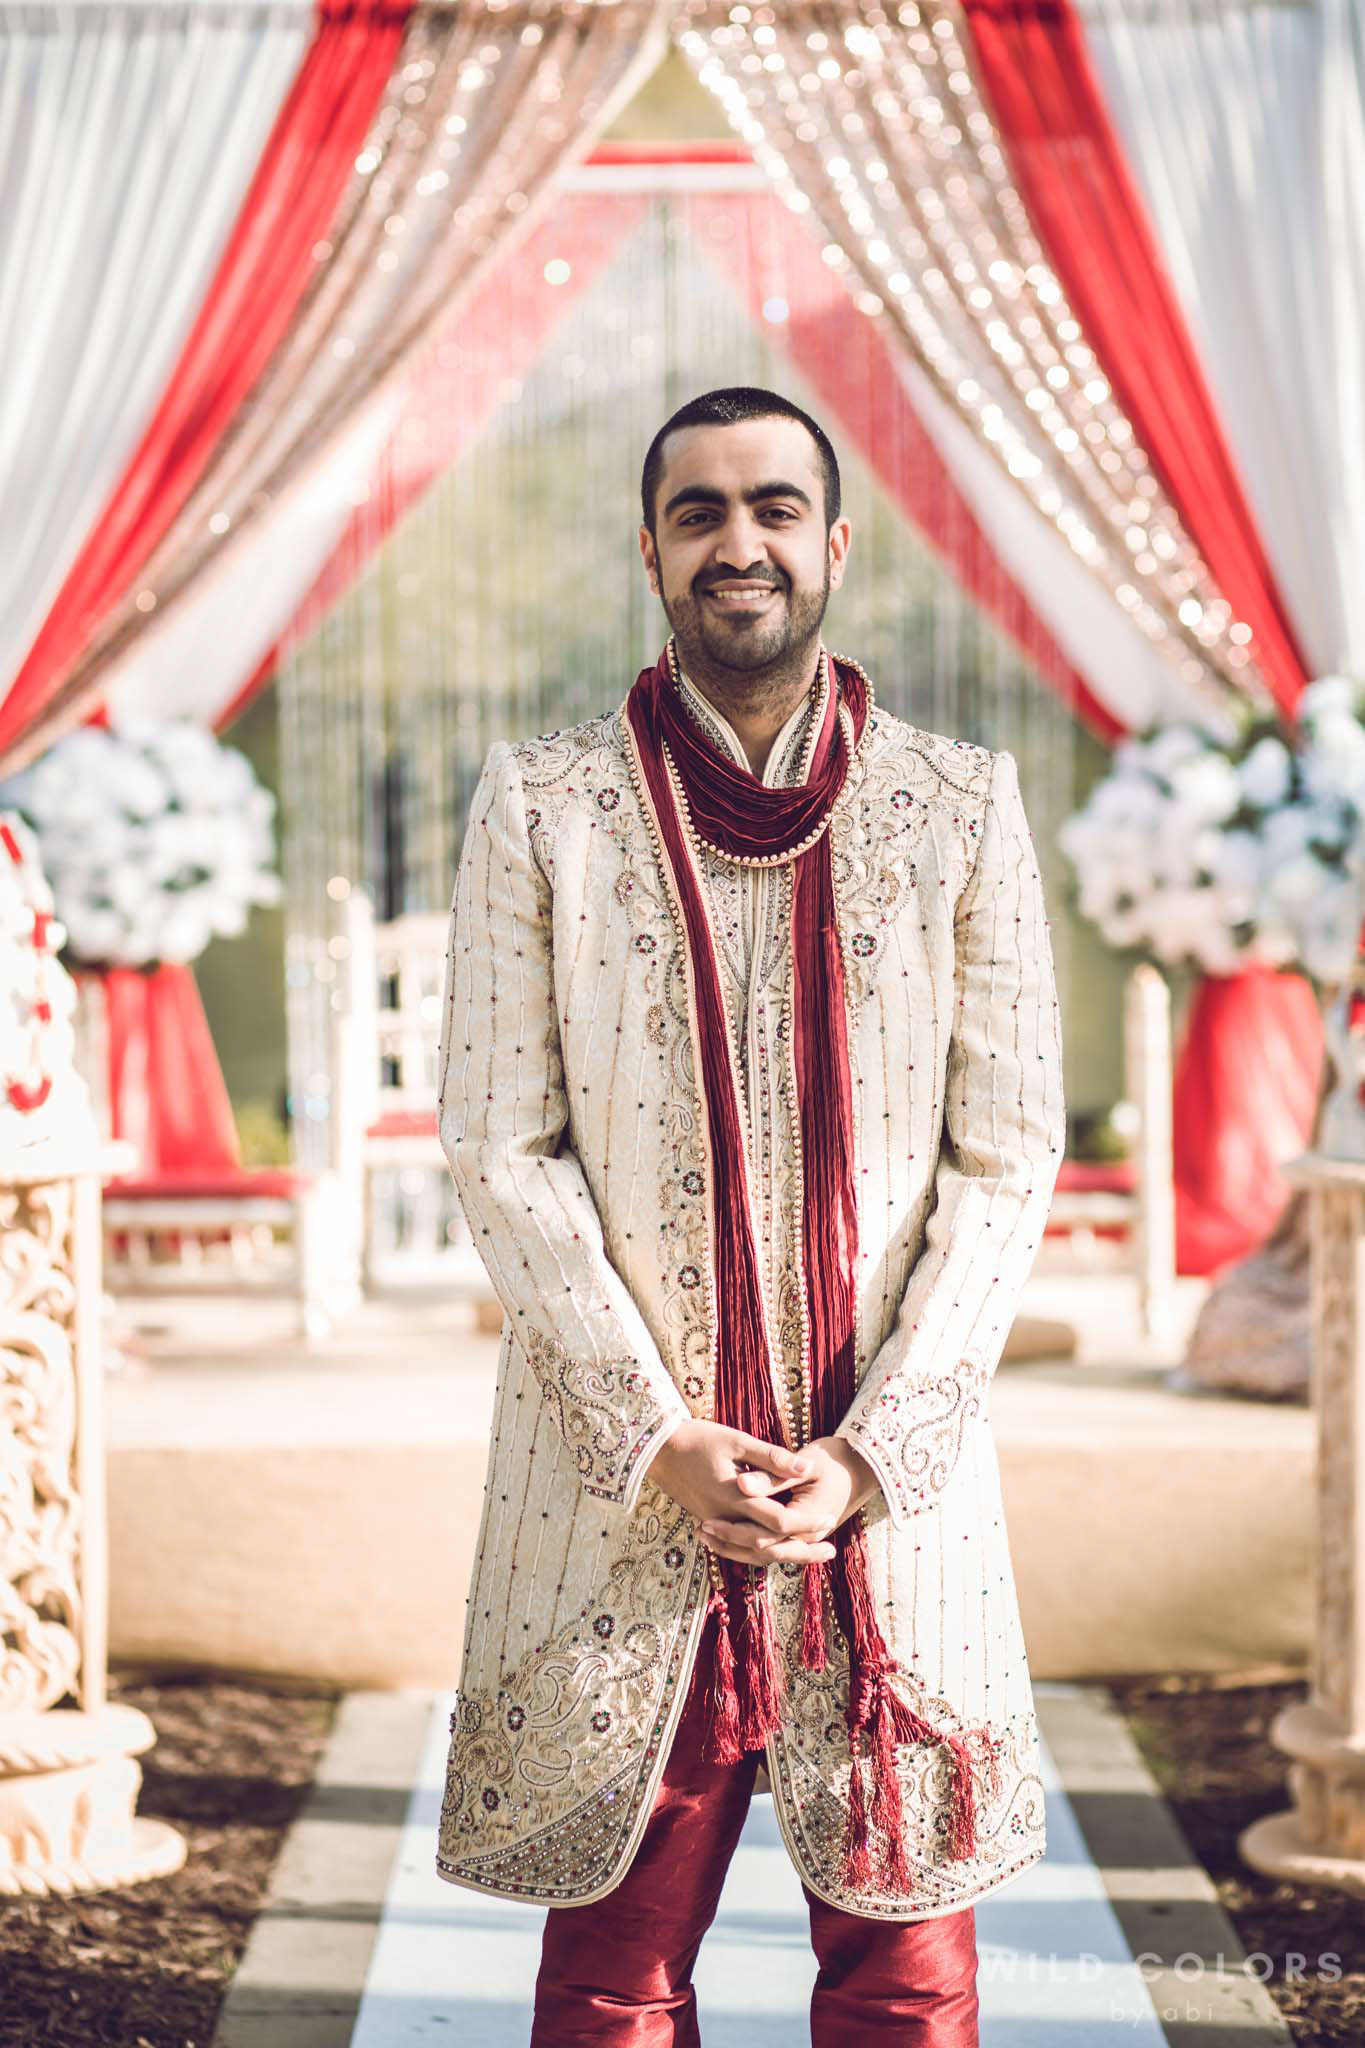 CANDID_INDIAN_WEDDING_ATLANTA_PHOTOGRAPHER-14.JPG